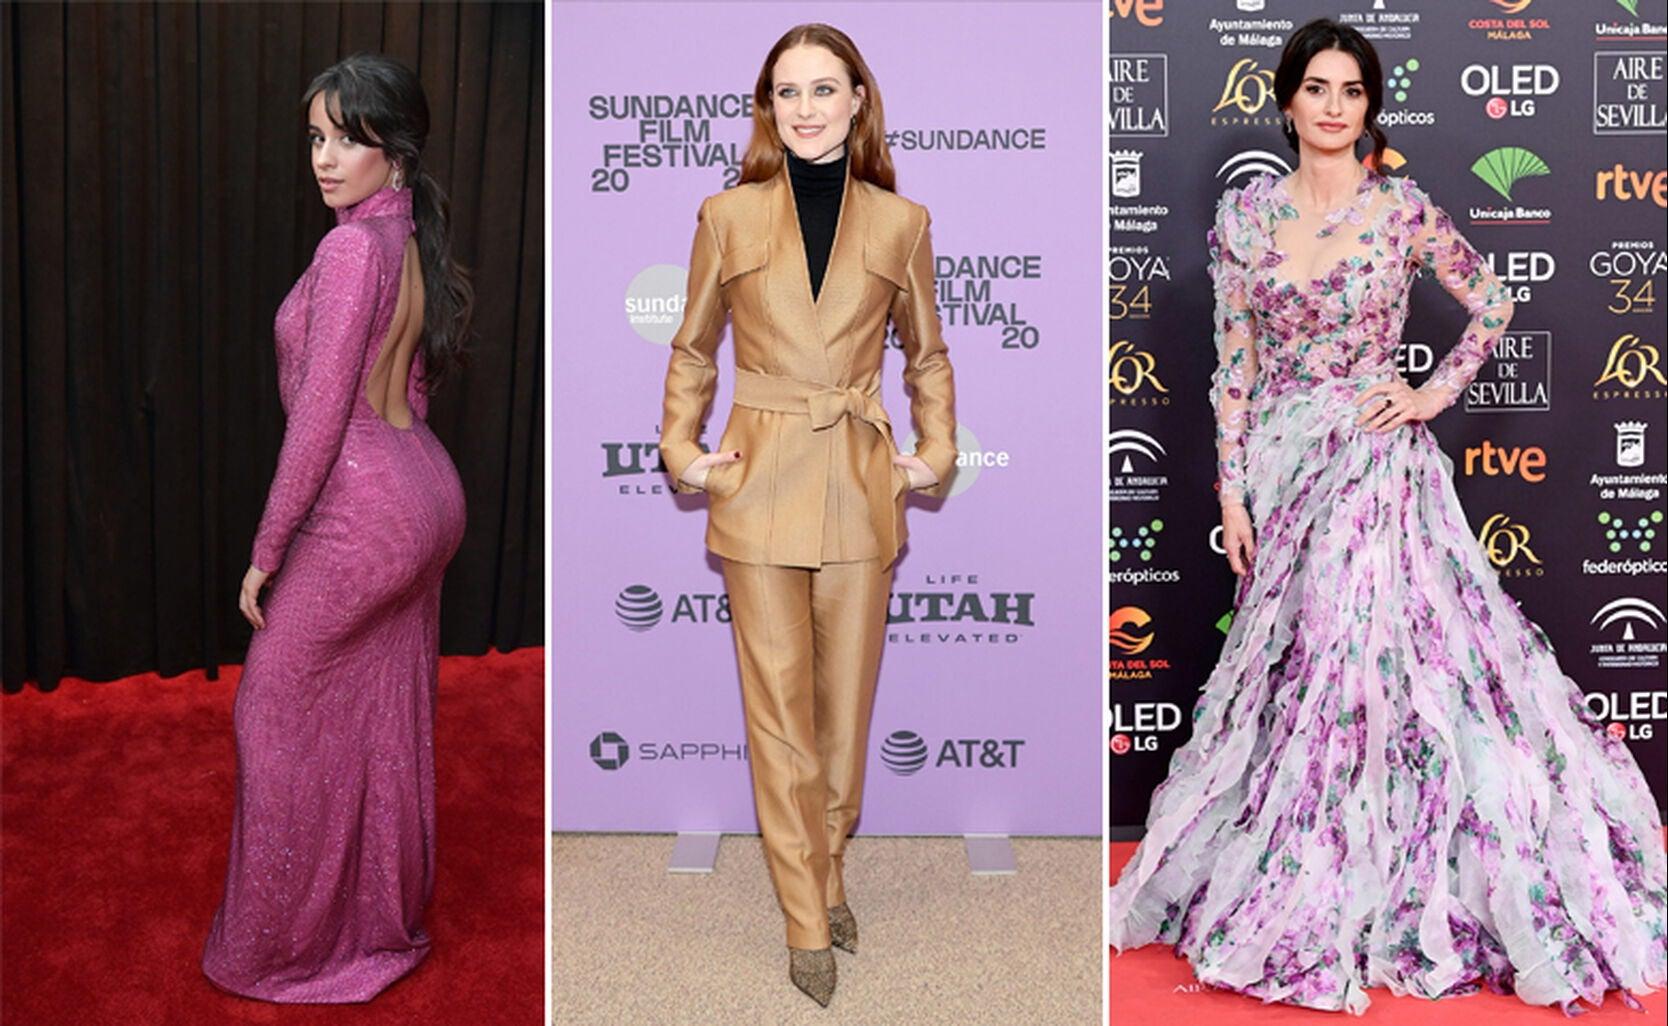 Camila Cabello, Evan Rachel Wood, Penelope Cruz